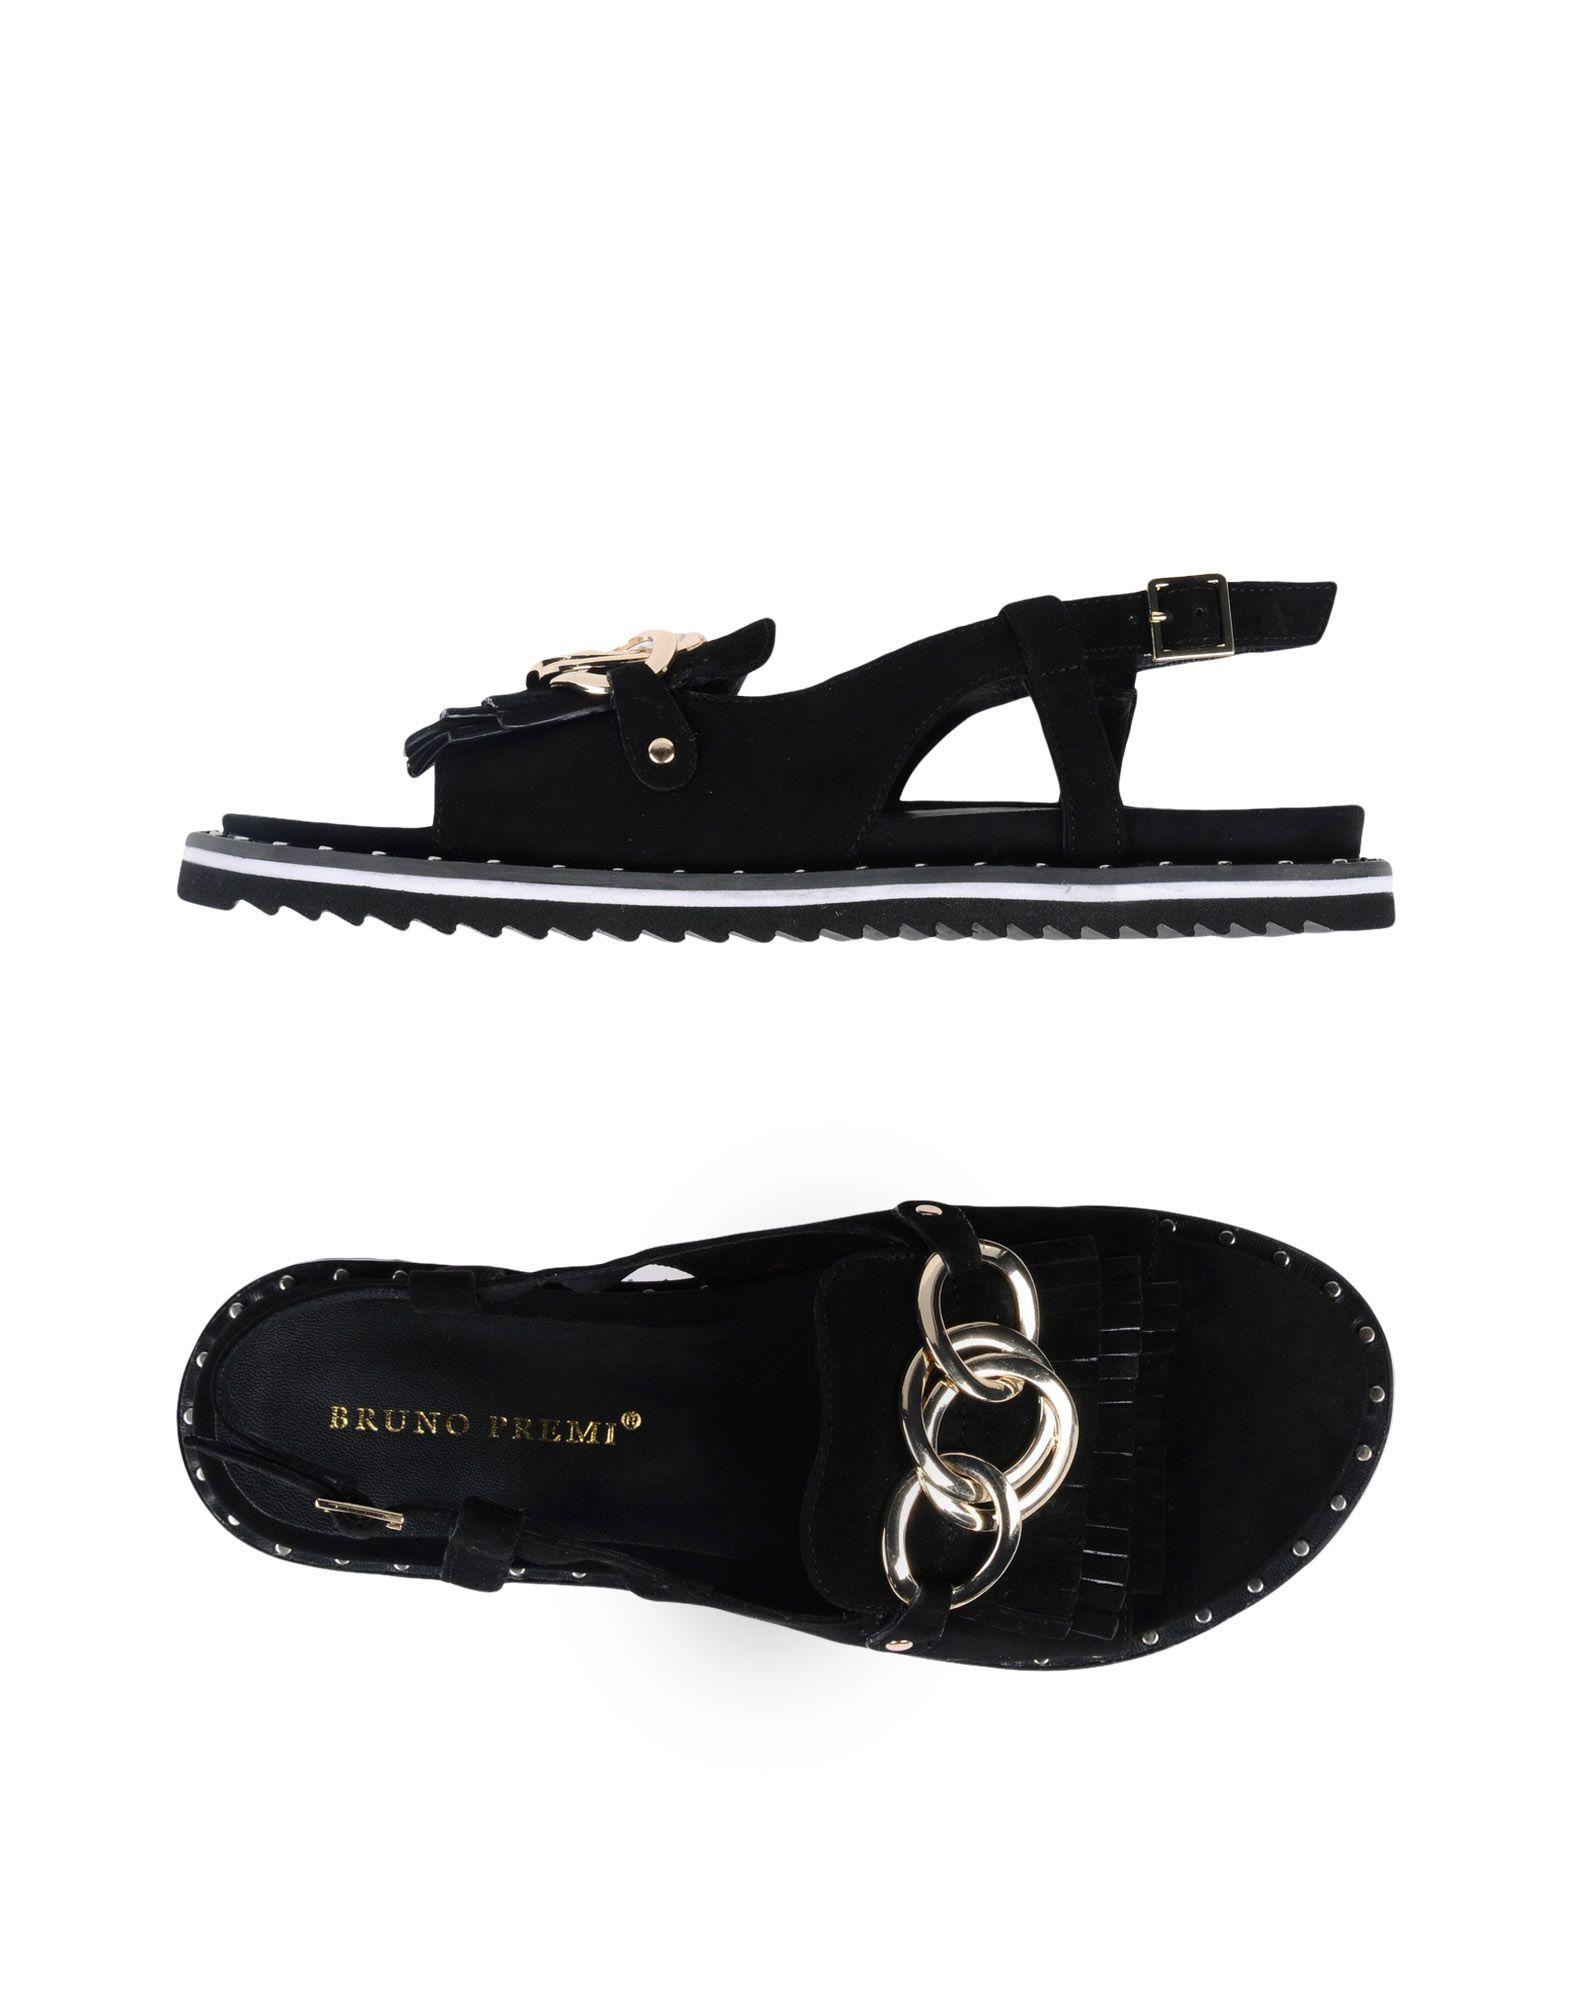 Bruno Premi Qualität Sandalen Damen  11443664MX Gute Qualität Premi beliebte Schuhe 12ba7d